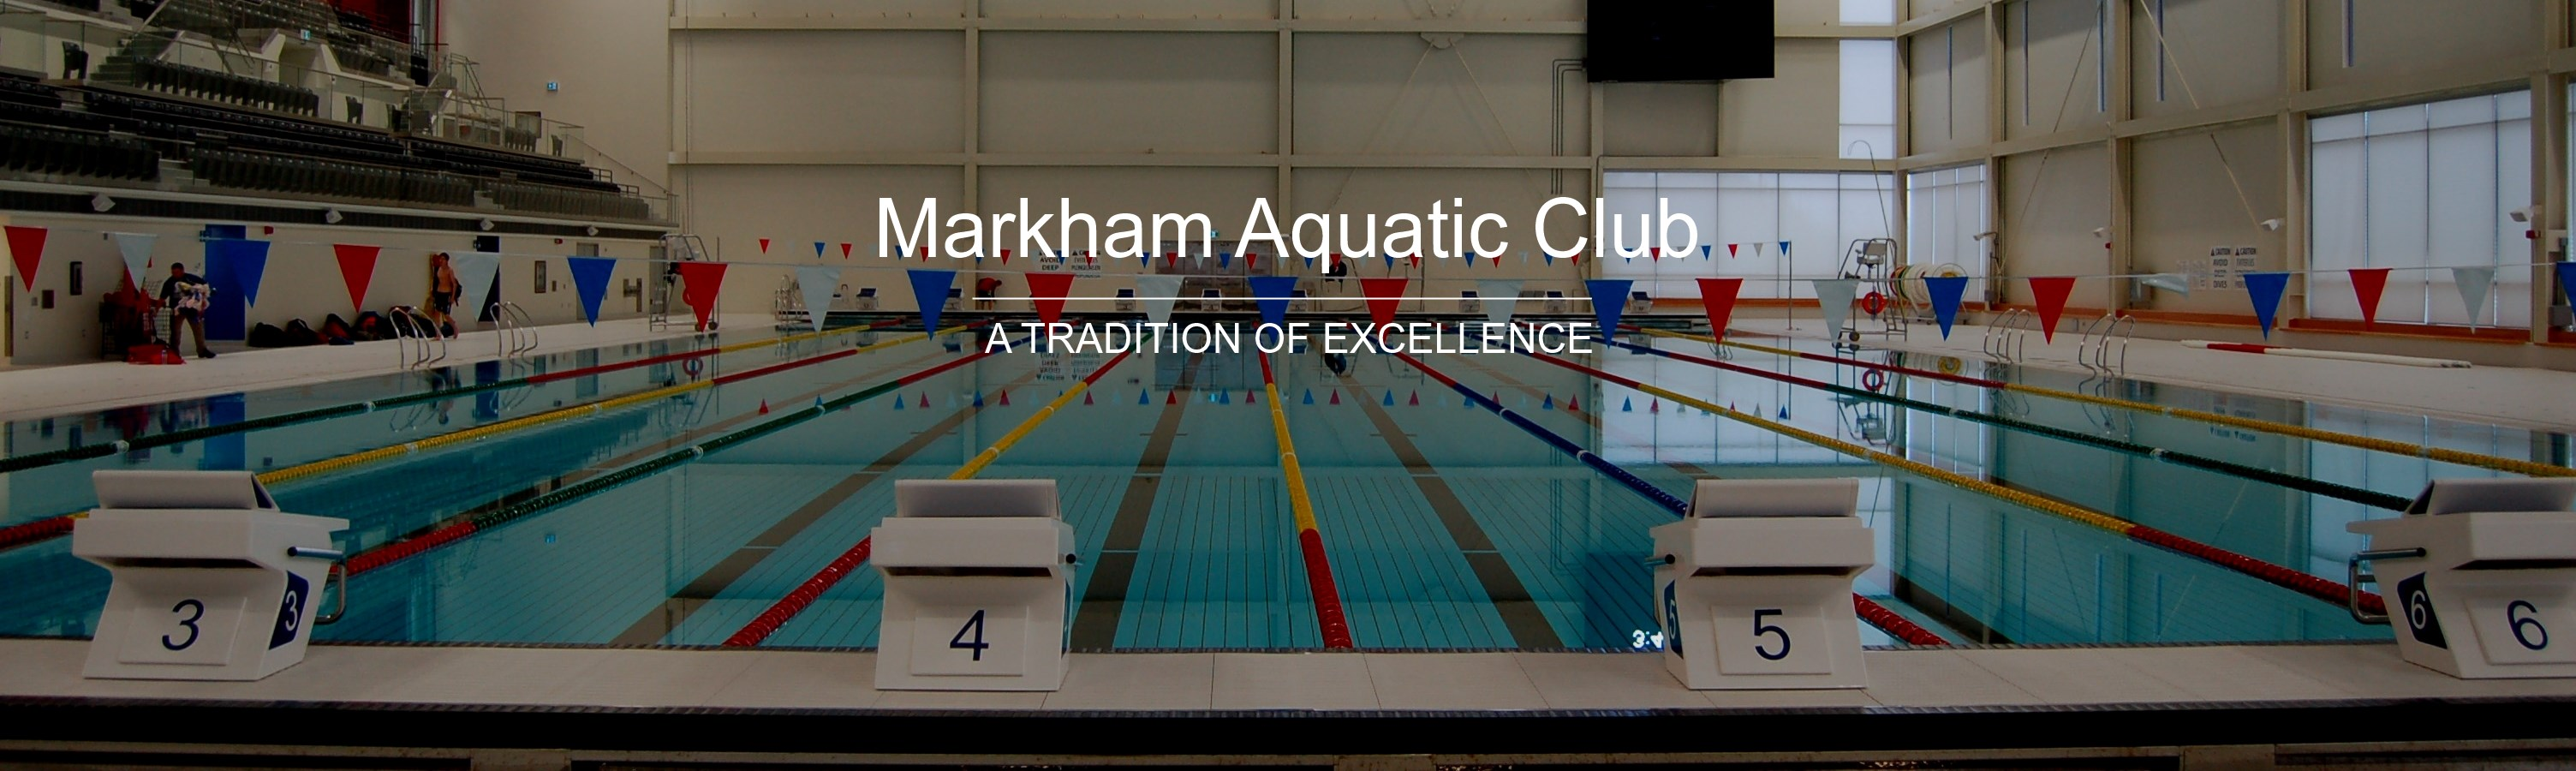 Markham Aquatic Club Home